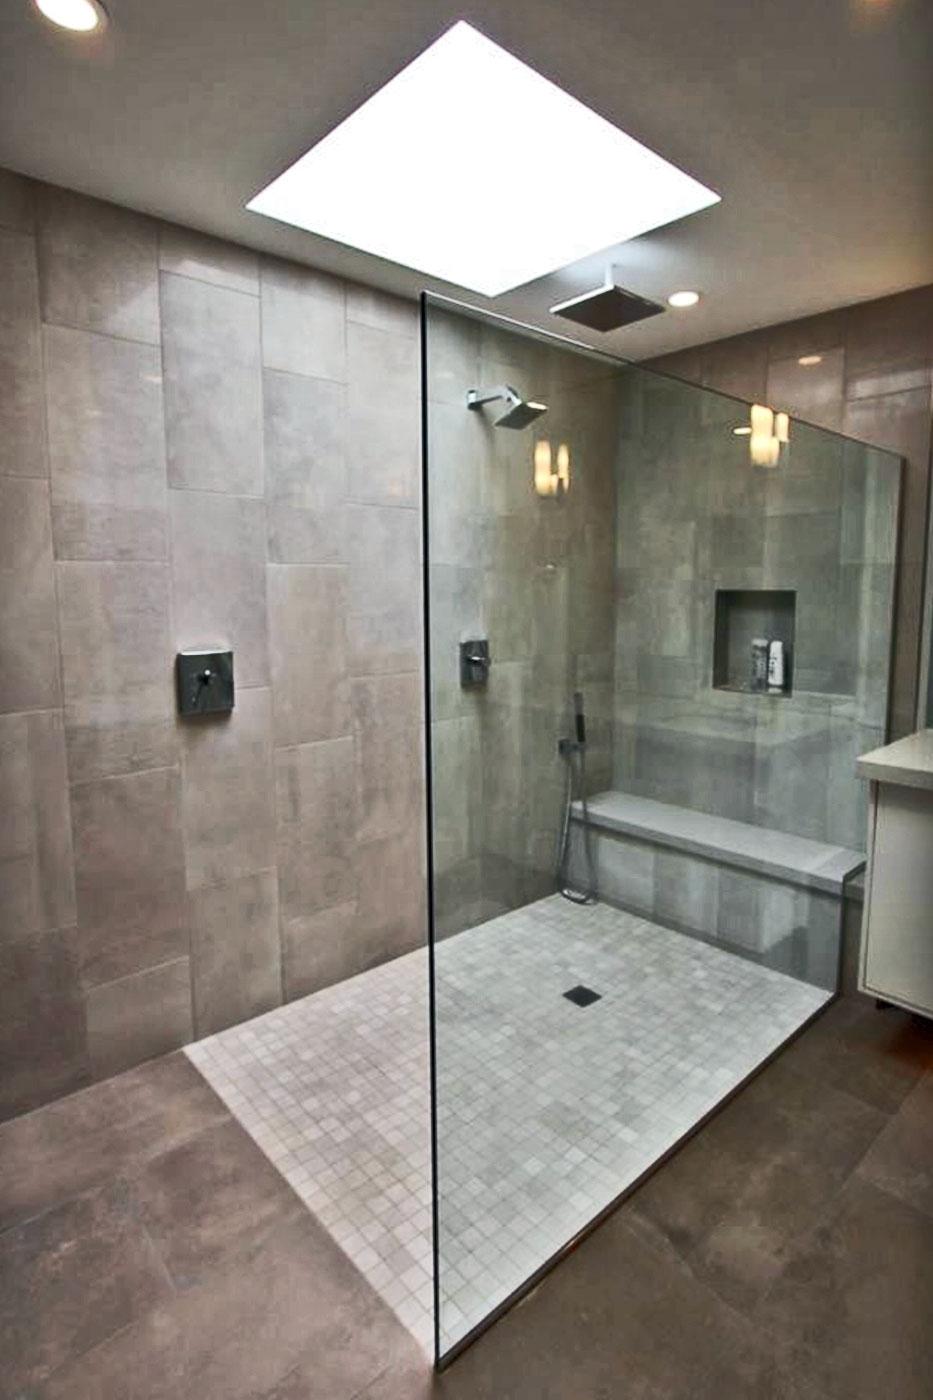 https://palmdesertbuilder.com/wp-content/uploads/2018/09/Palm-Springs-Kitchen-Bathroom-Remodel-Premier-0-med.jpg